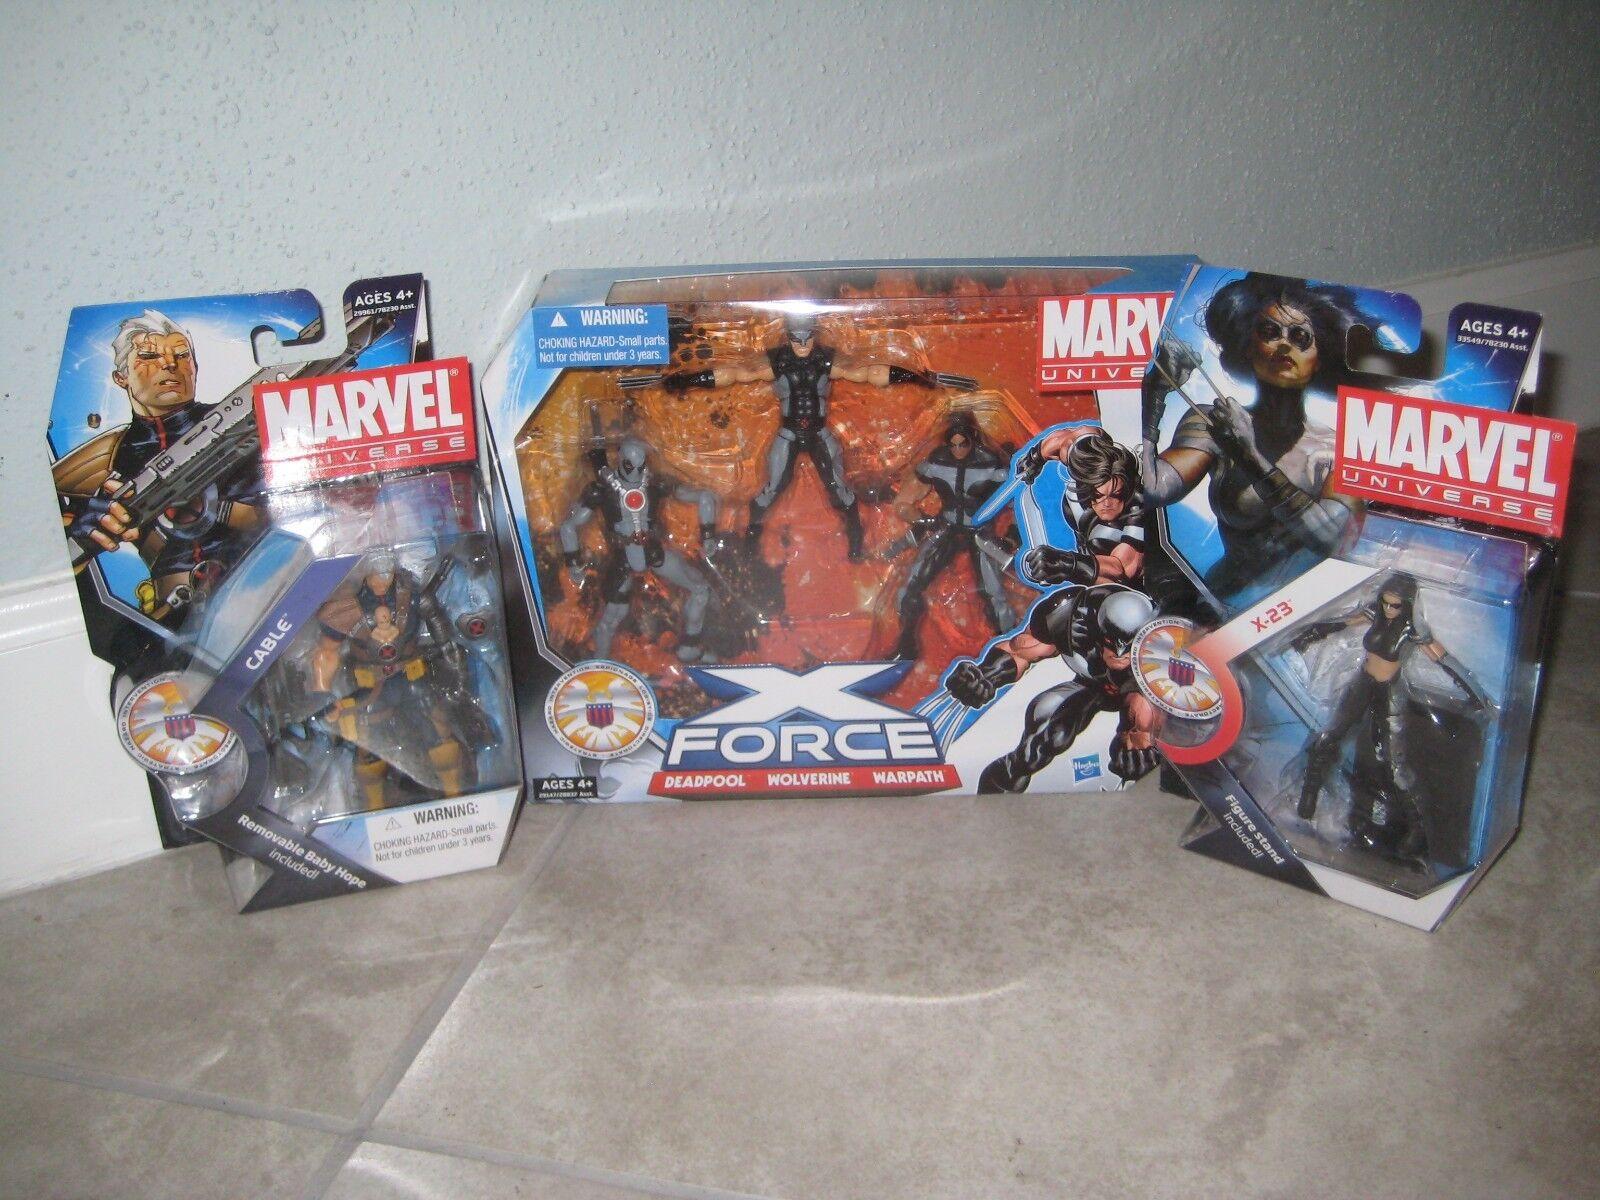 Marvel Universe 3.75 Legends Infinite X-Force 3pk DEADPOOL CABLE X-23 X-23 X-23 Lot NEW bea48d